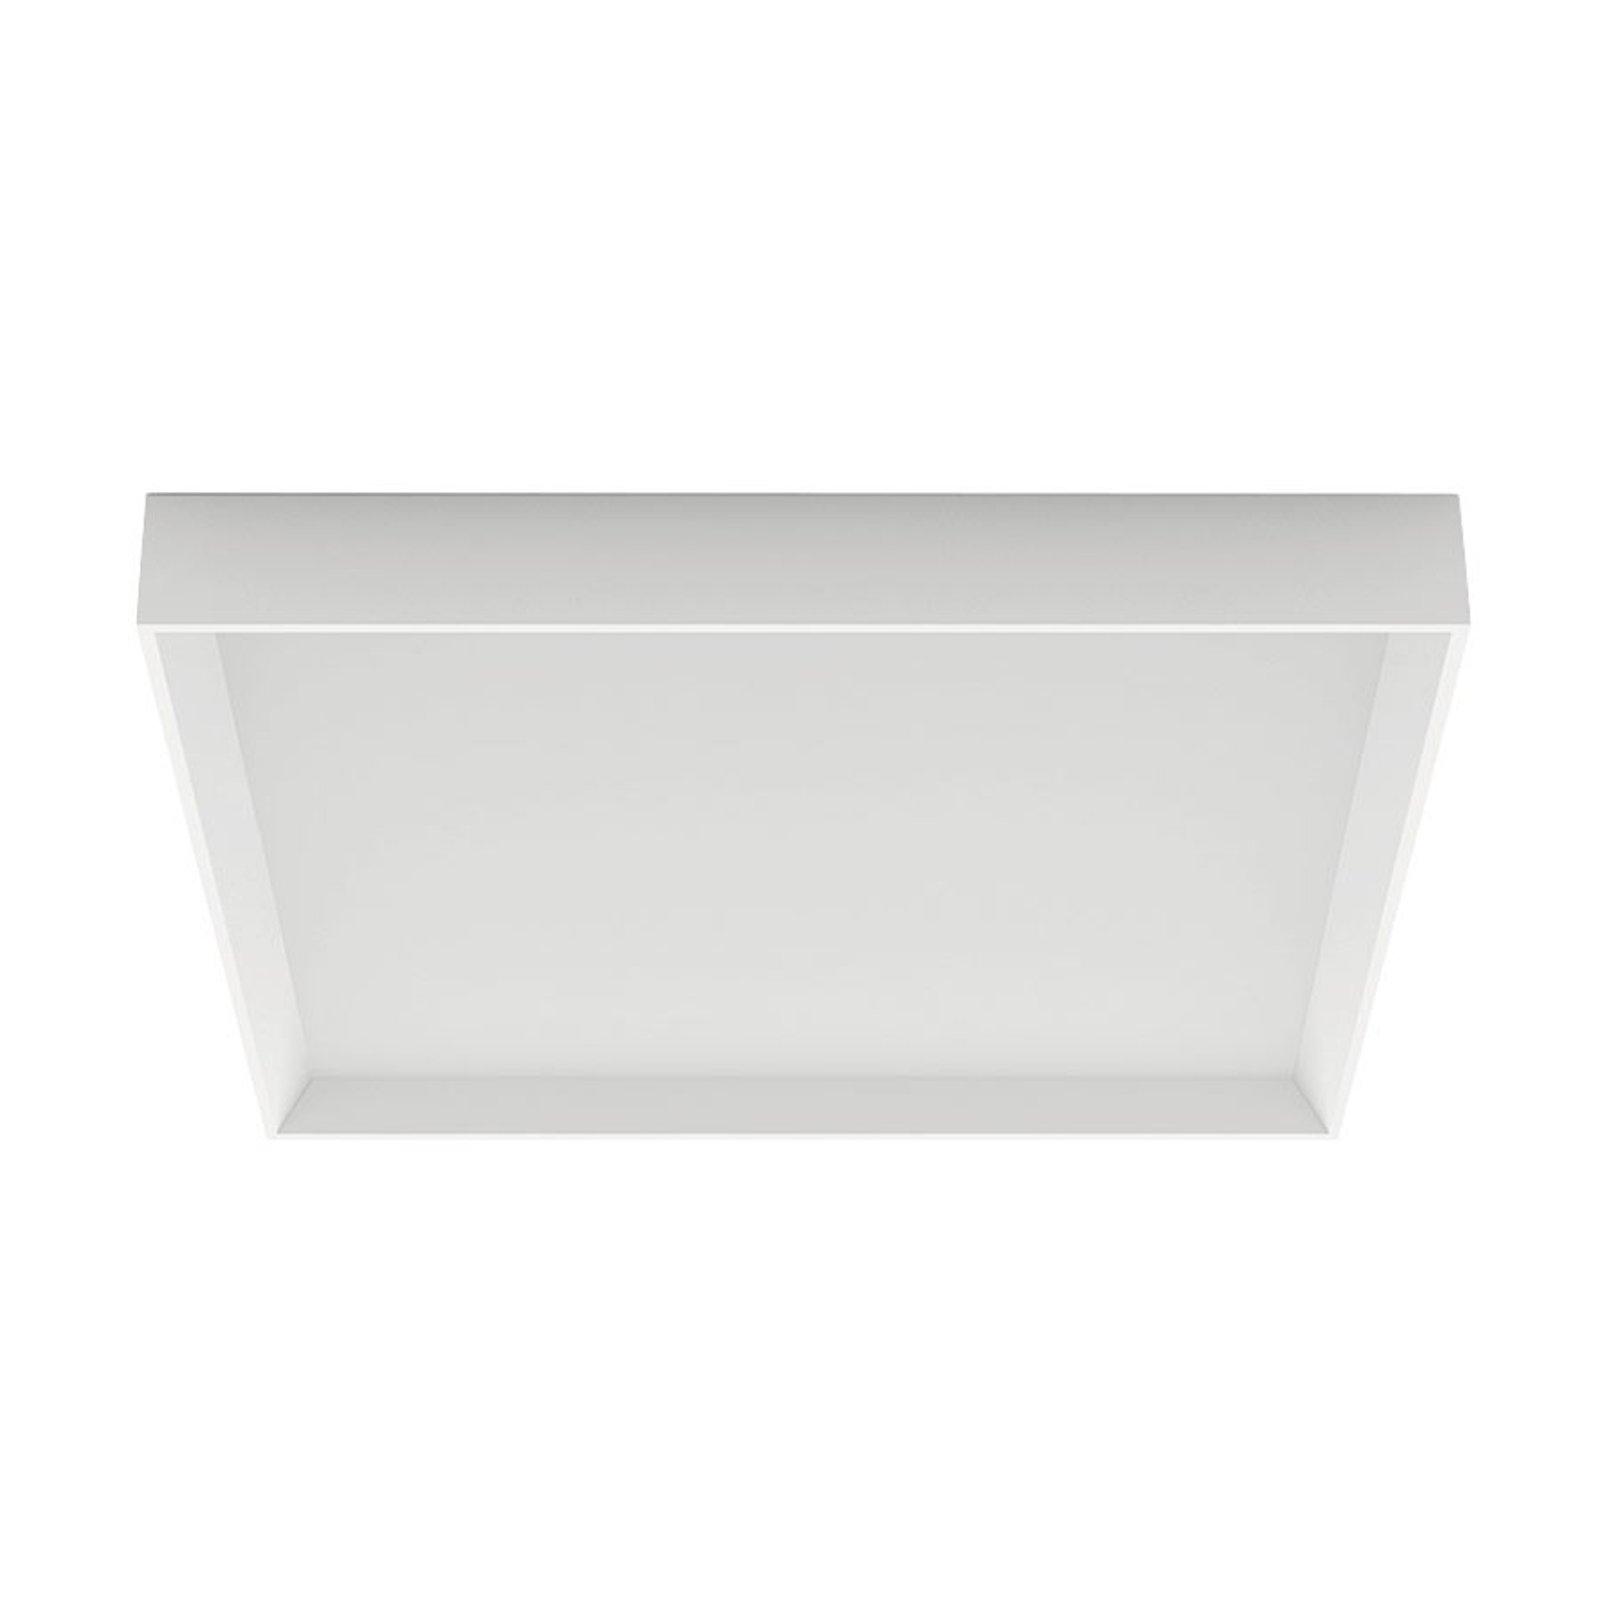 Tara Q LED-taklampe, kantet, 50 x 50 cm